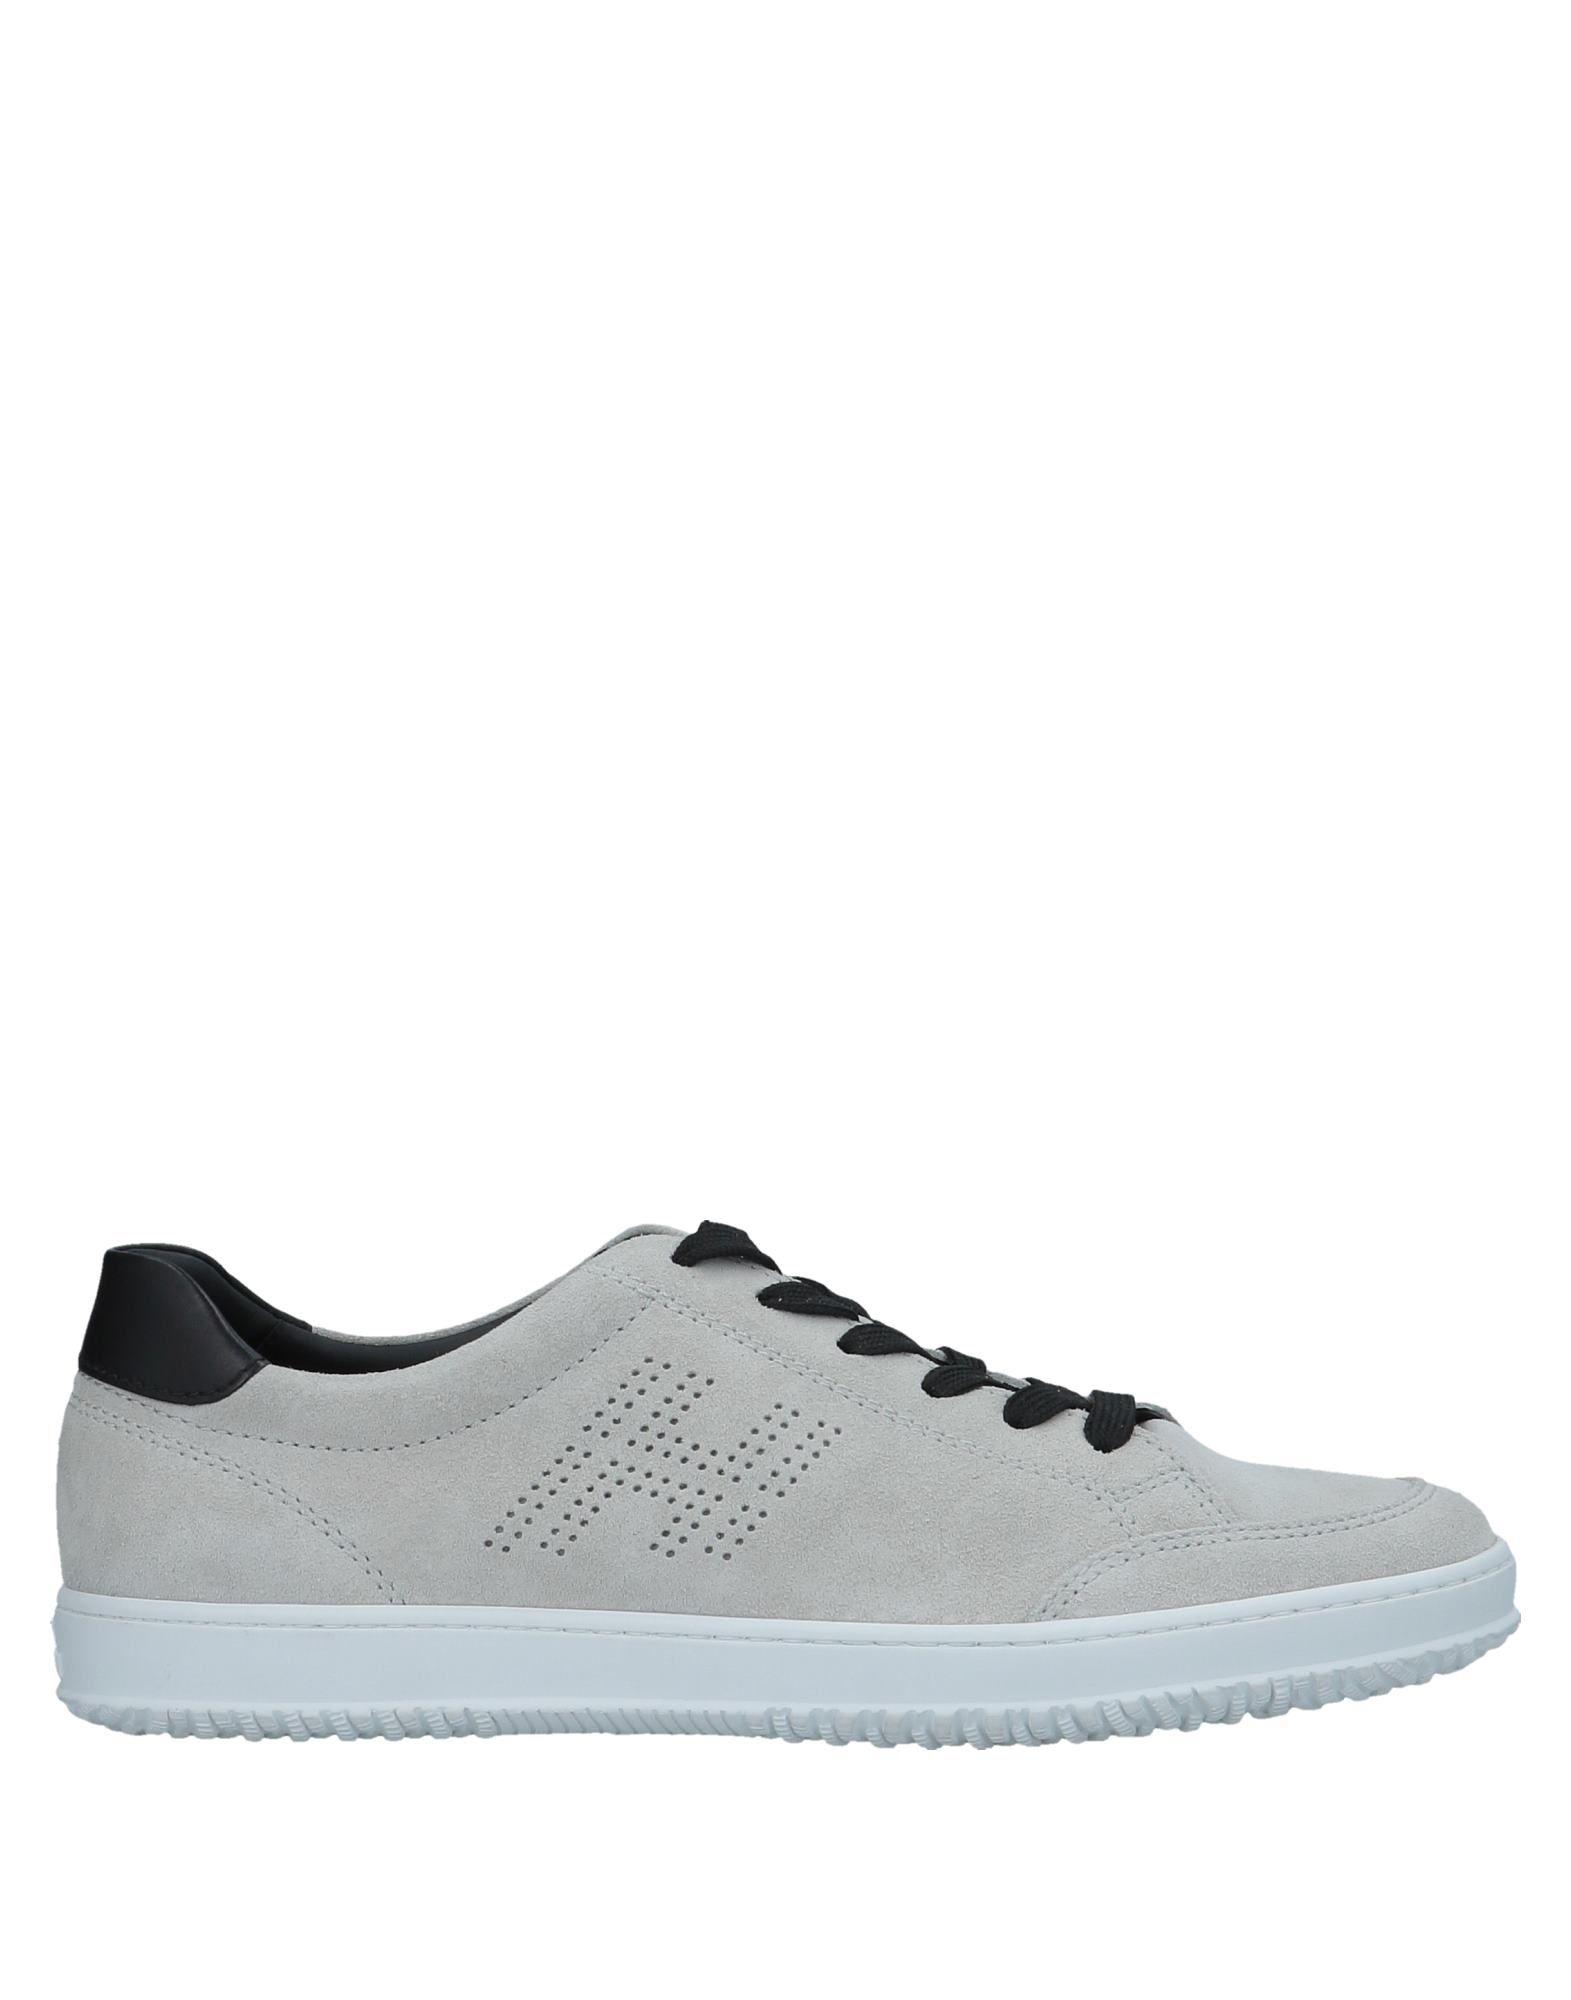 Hogan Sneakers Herren  11541369WD Gute Qualität beliebte Schuhe